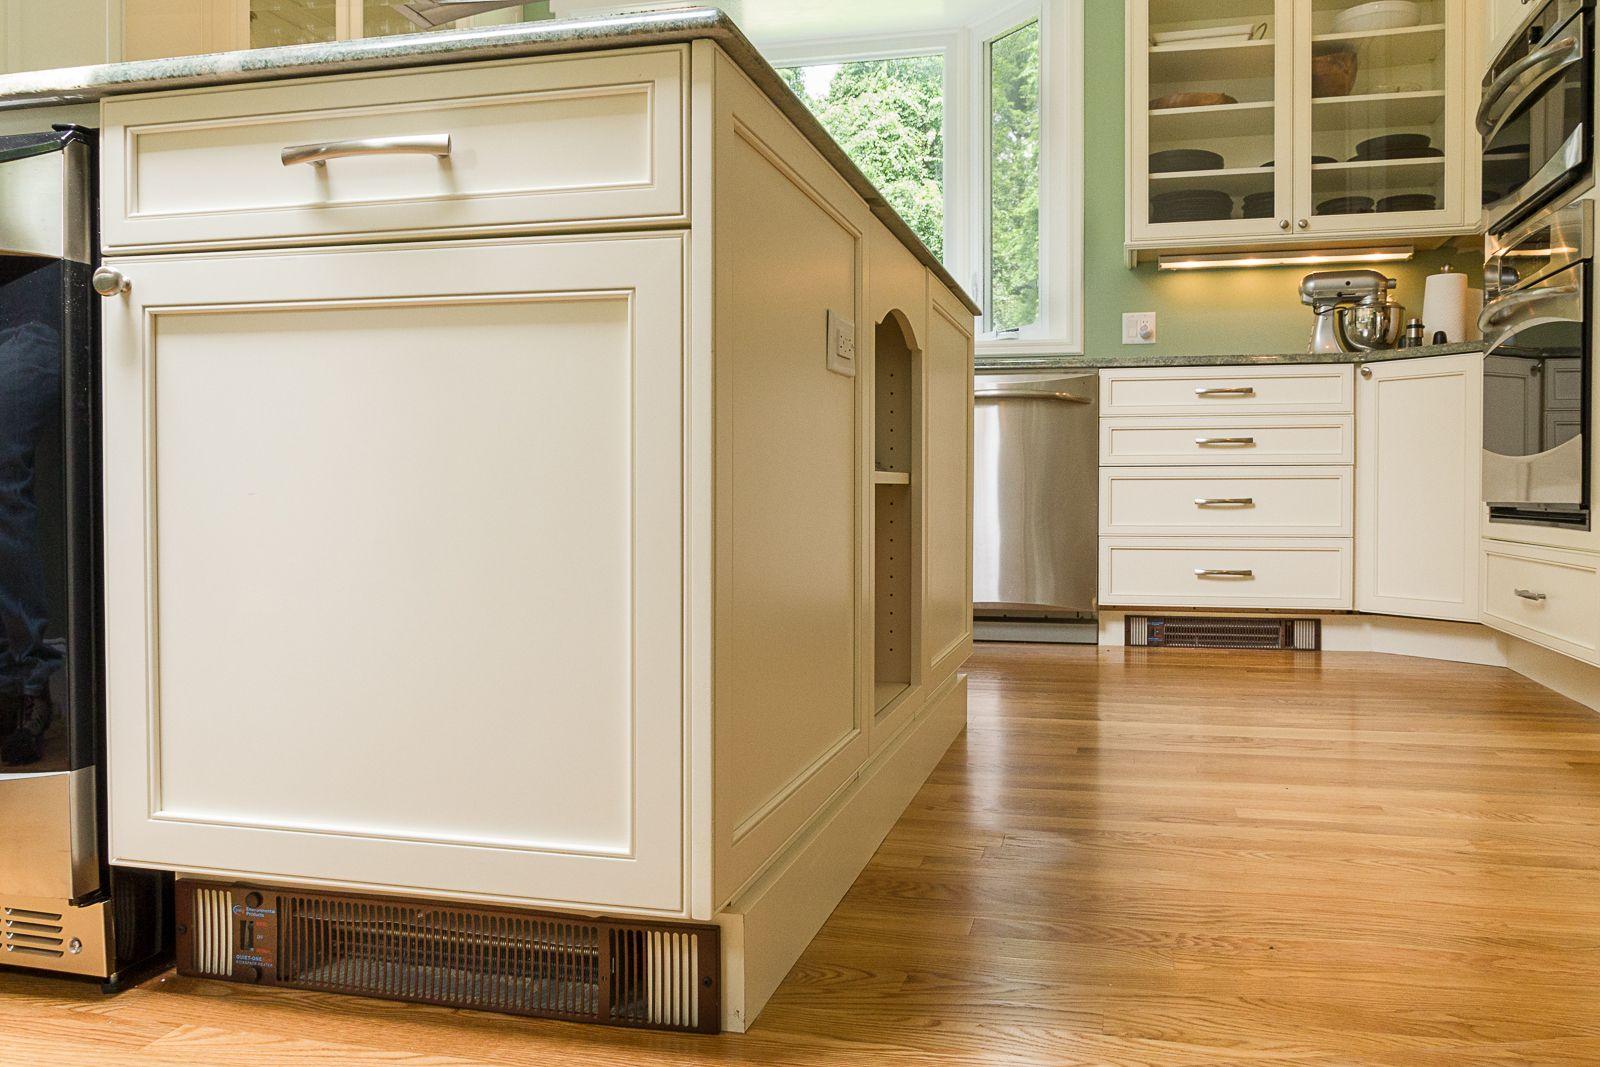 Buildit2 Kitchen Remodeling Baseboard Heating Installing Kitchen Cabinets Kitchen Cabinets